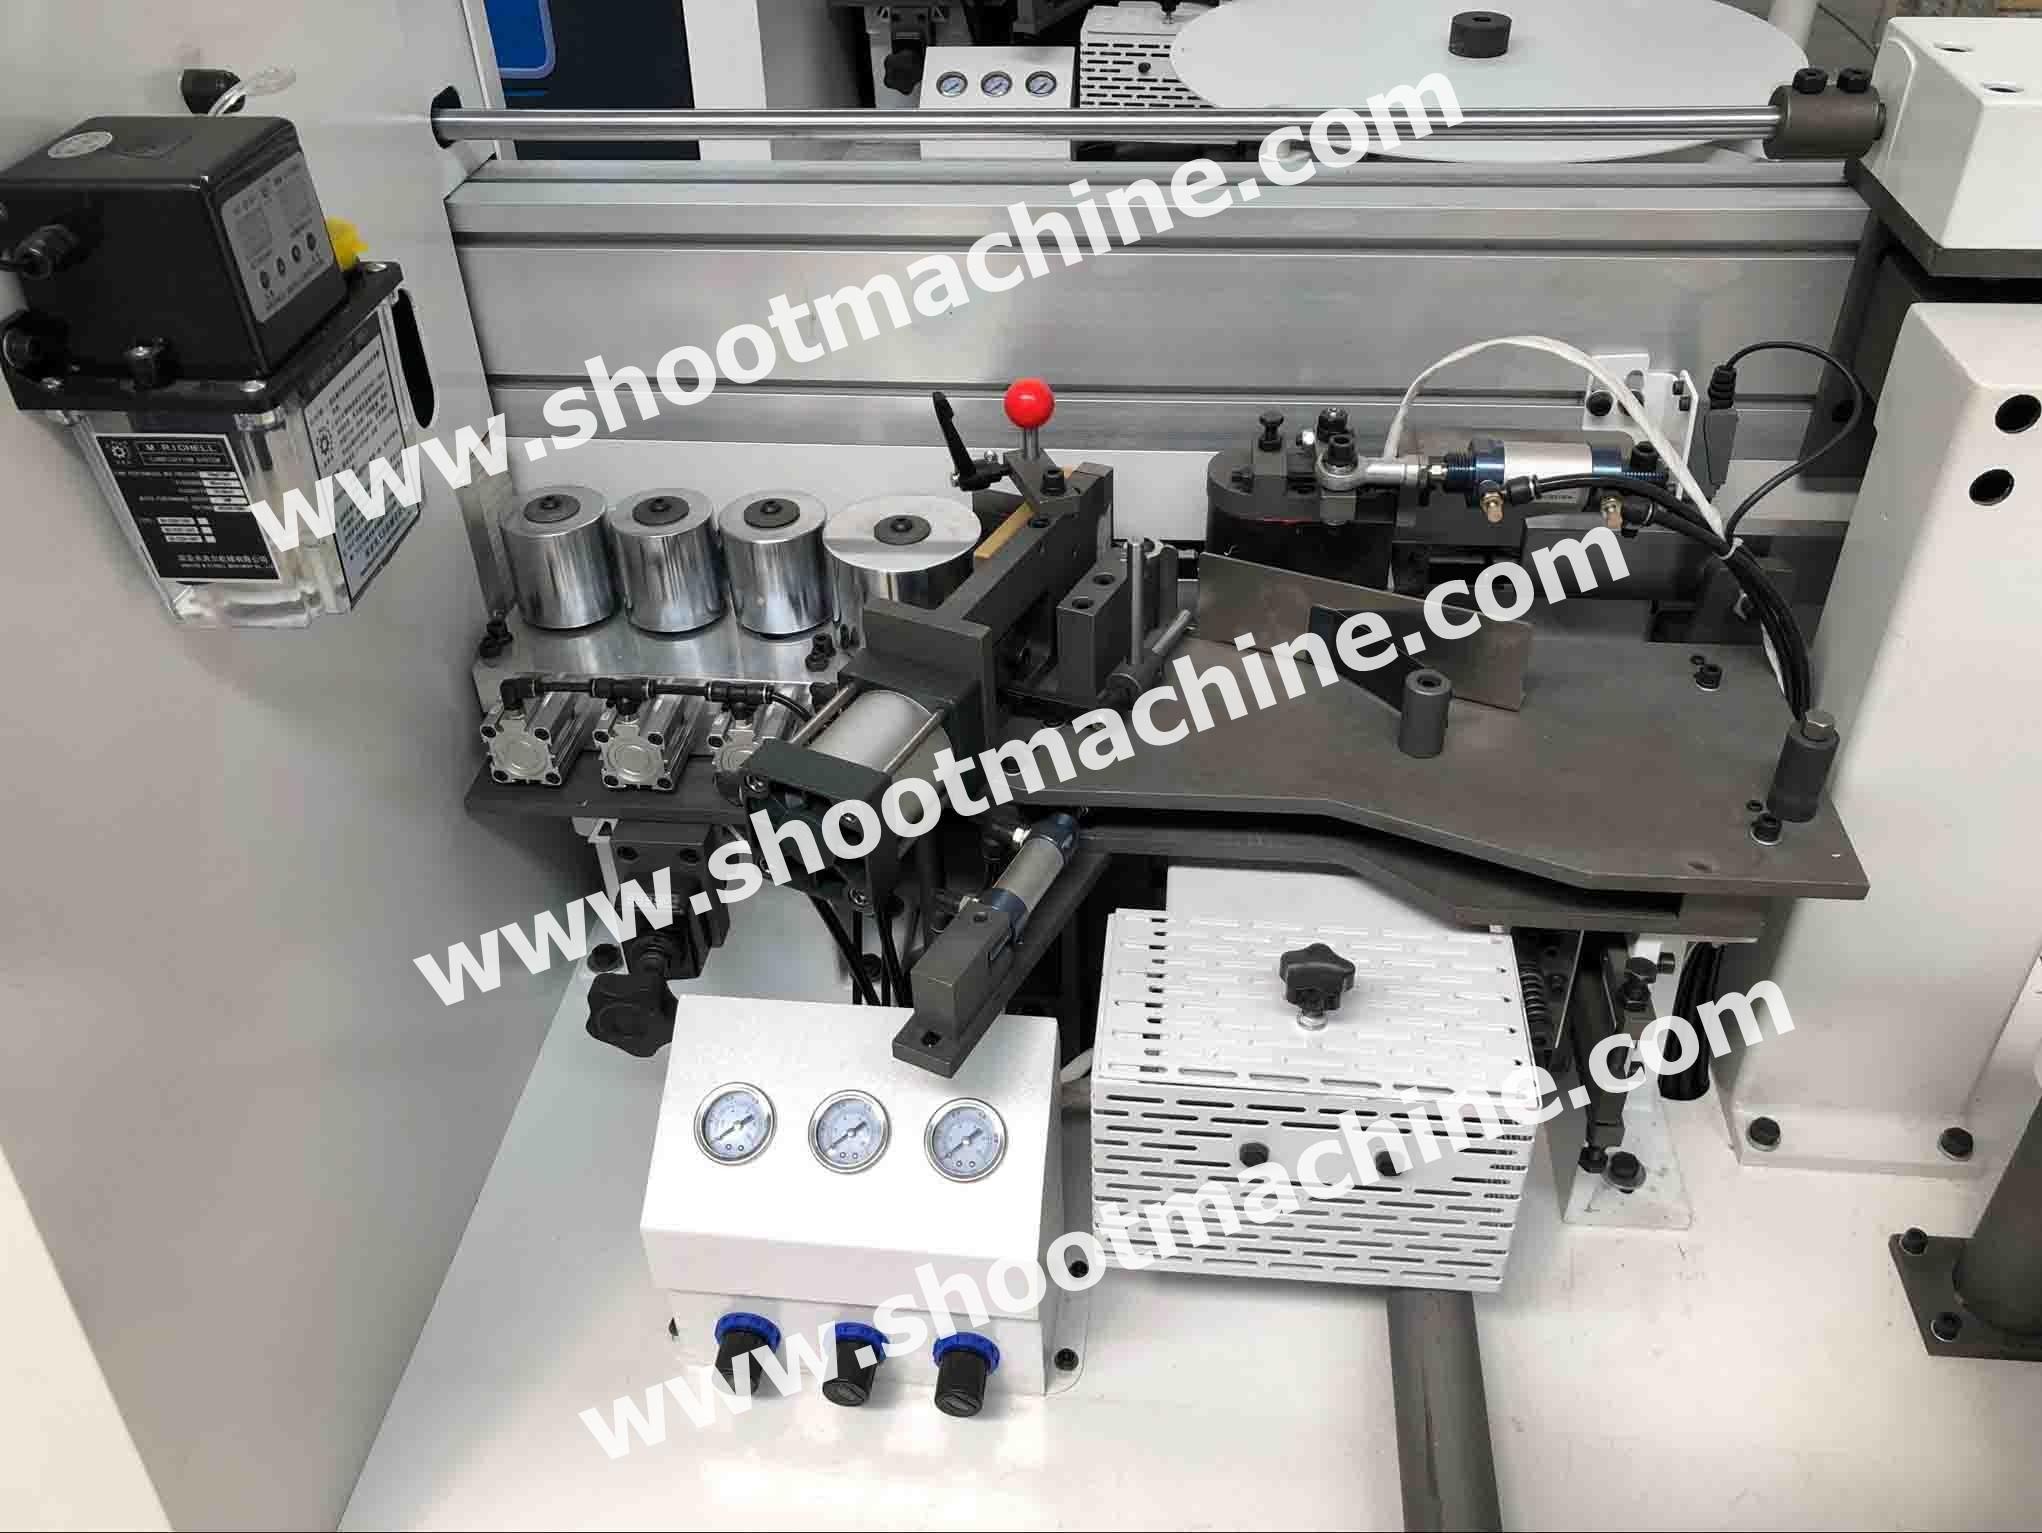 Woodworking High Quality Edge PVC Bander Machine, SH260 5